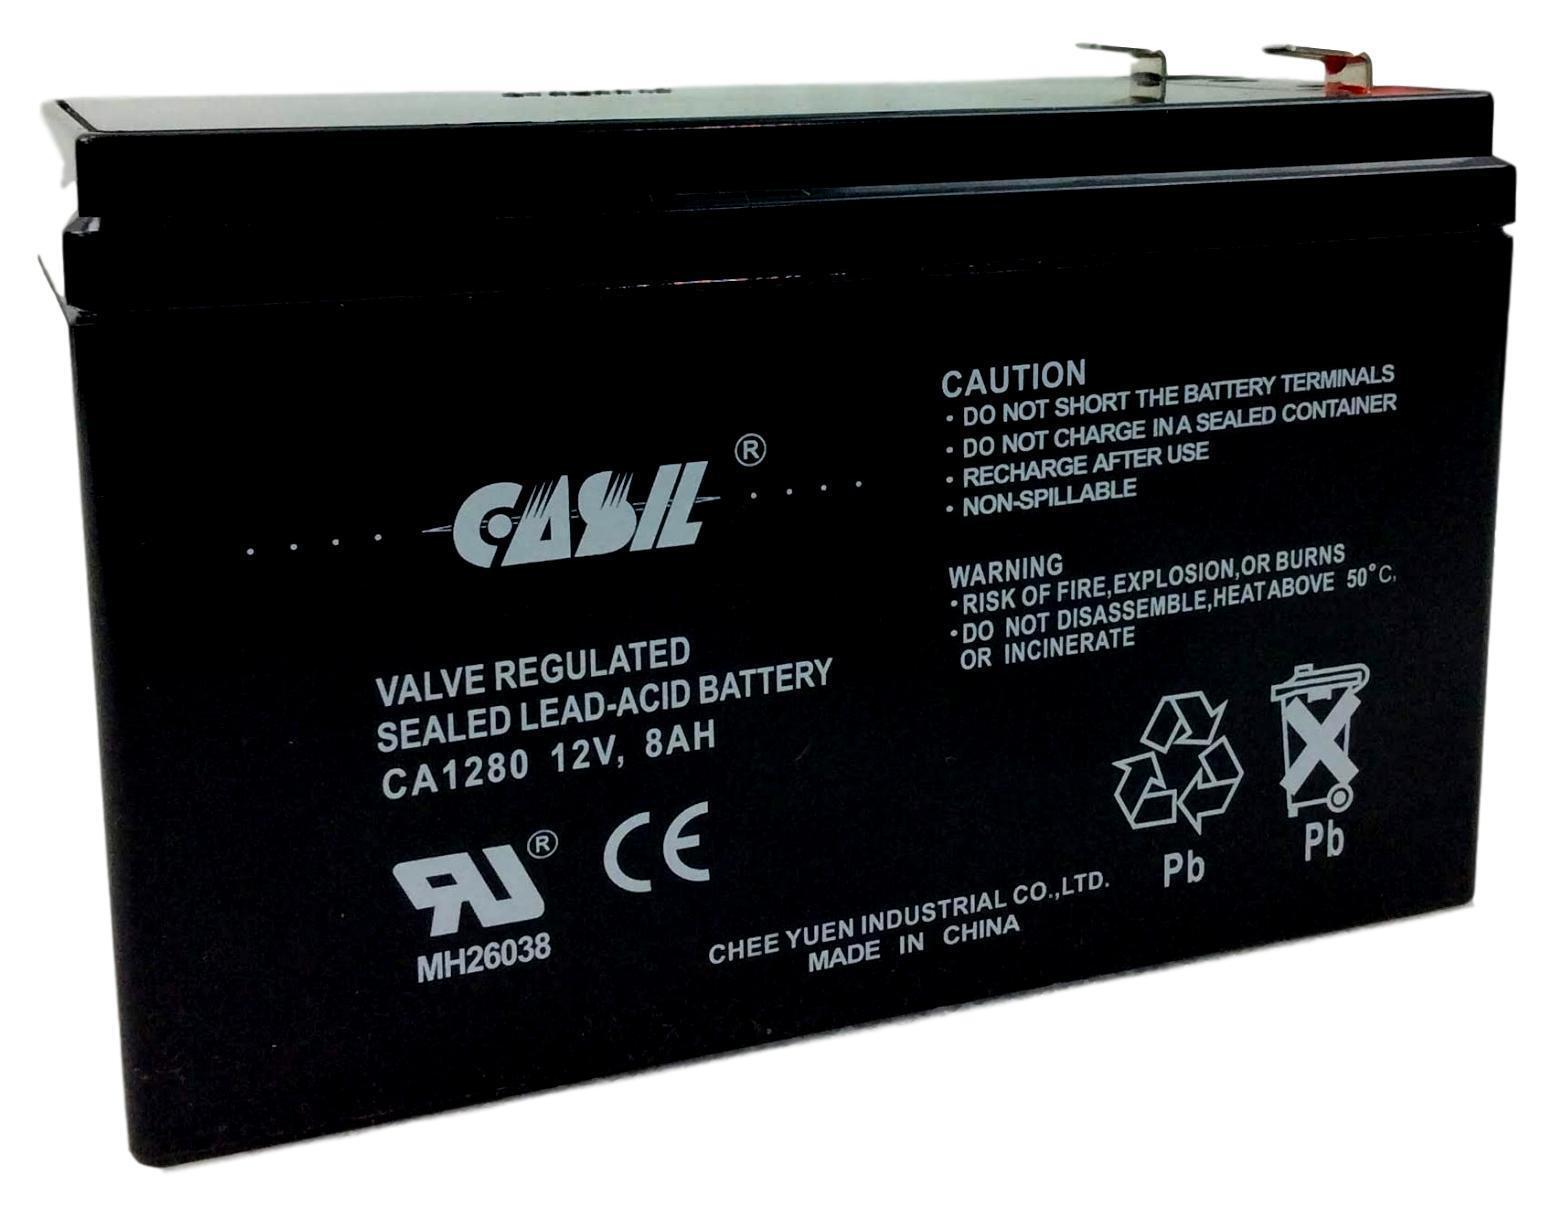 Casil 12V 8AH 7Ah 7.2ah Sealed Lead Acid Battery replaces GS